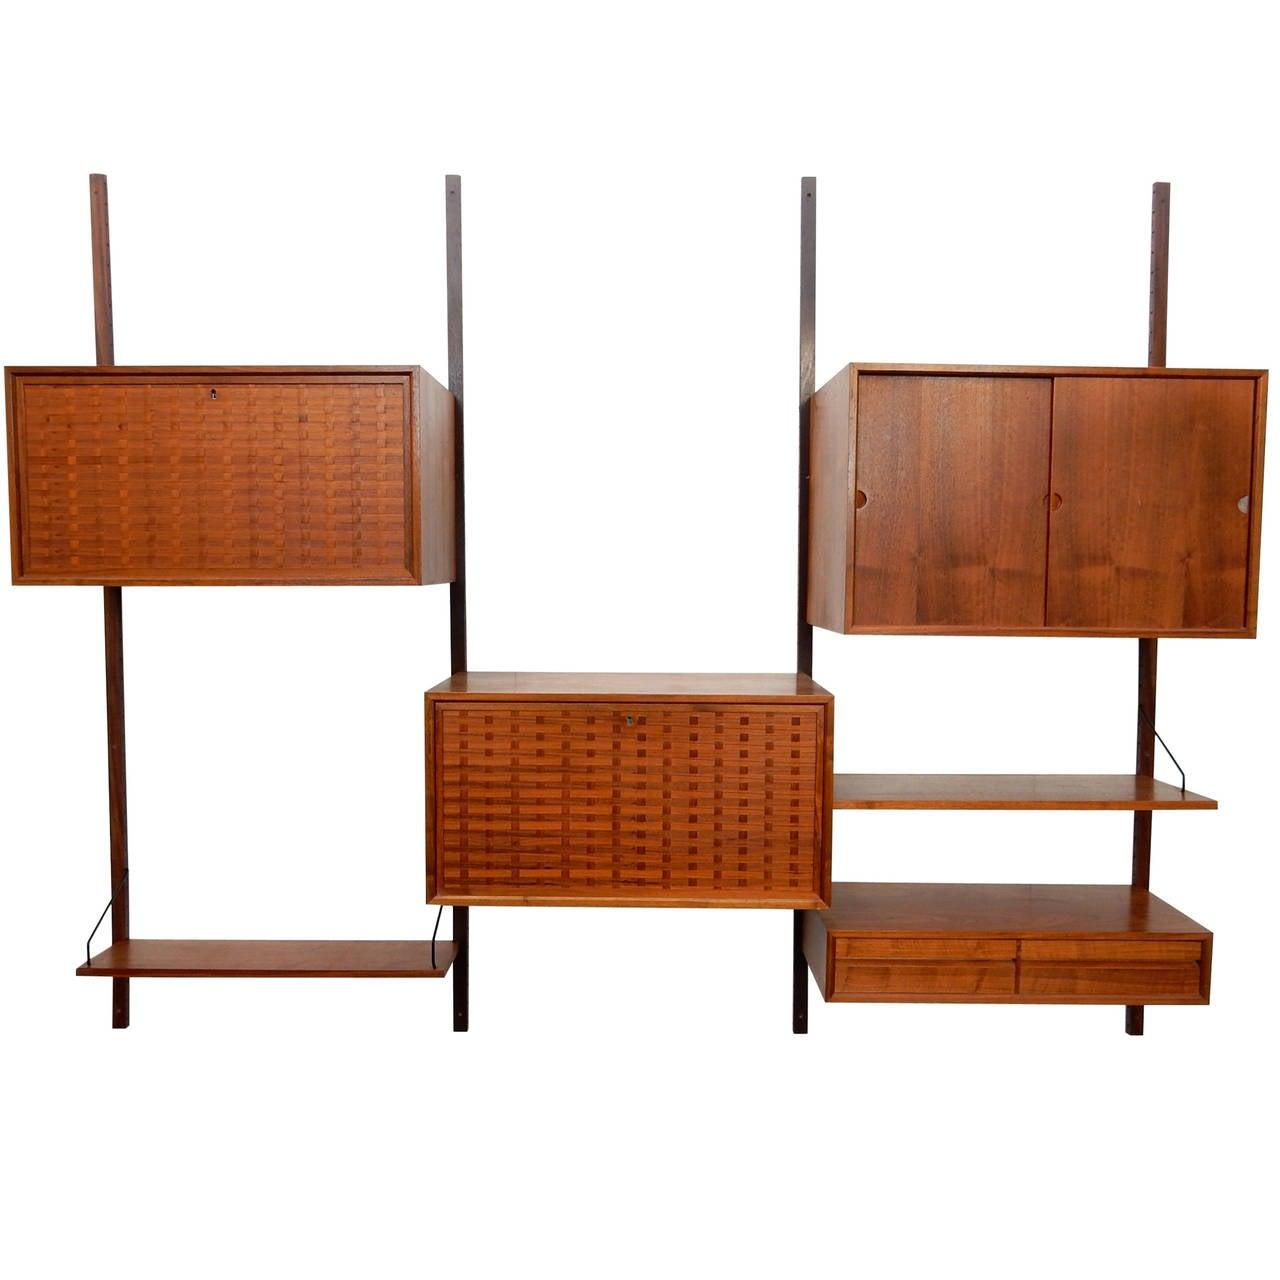 mid century modern poul cadovius cado wall unit cabinet. Black Bedroom Furniture Sets. Home Design Ideas